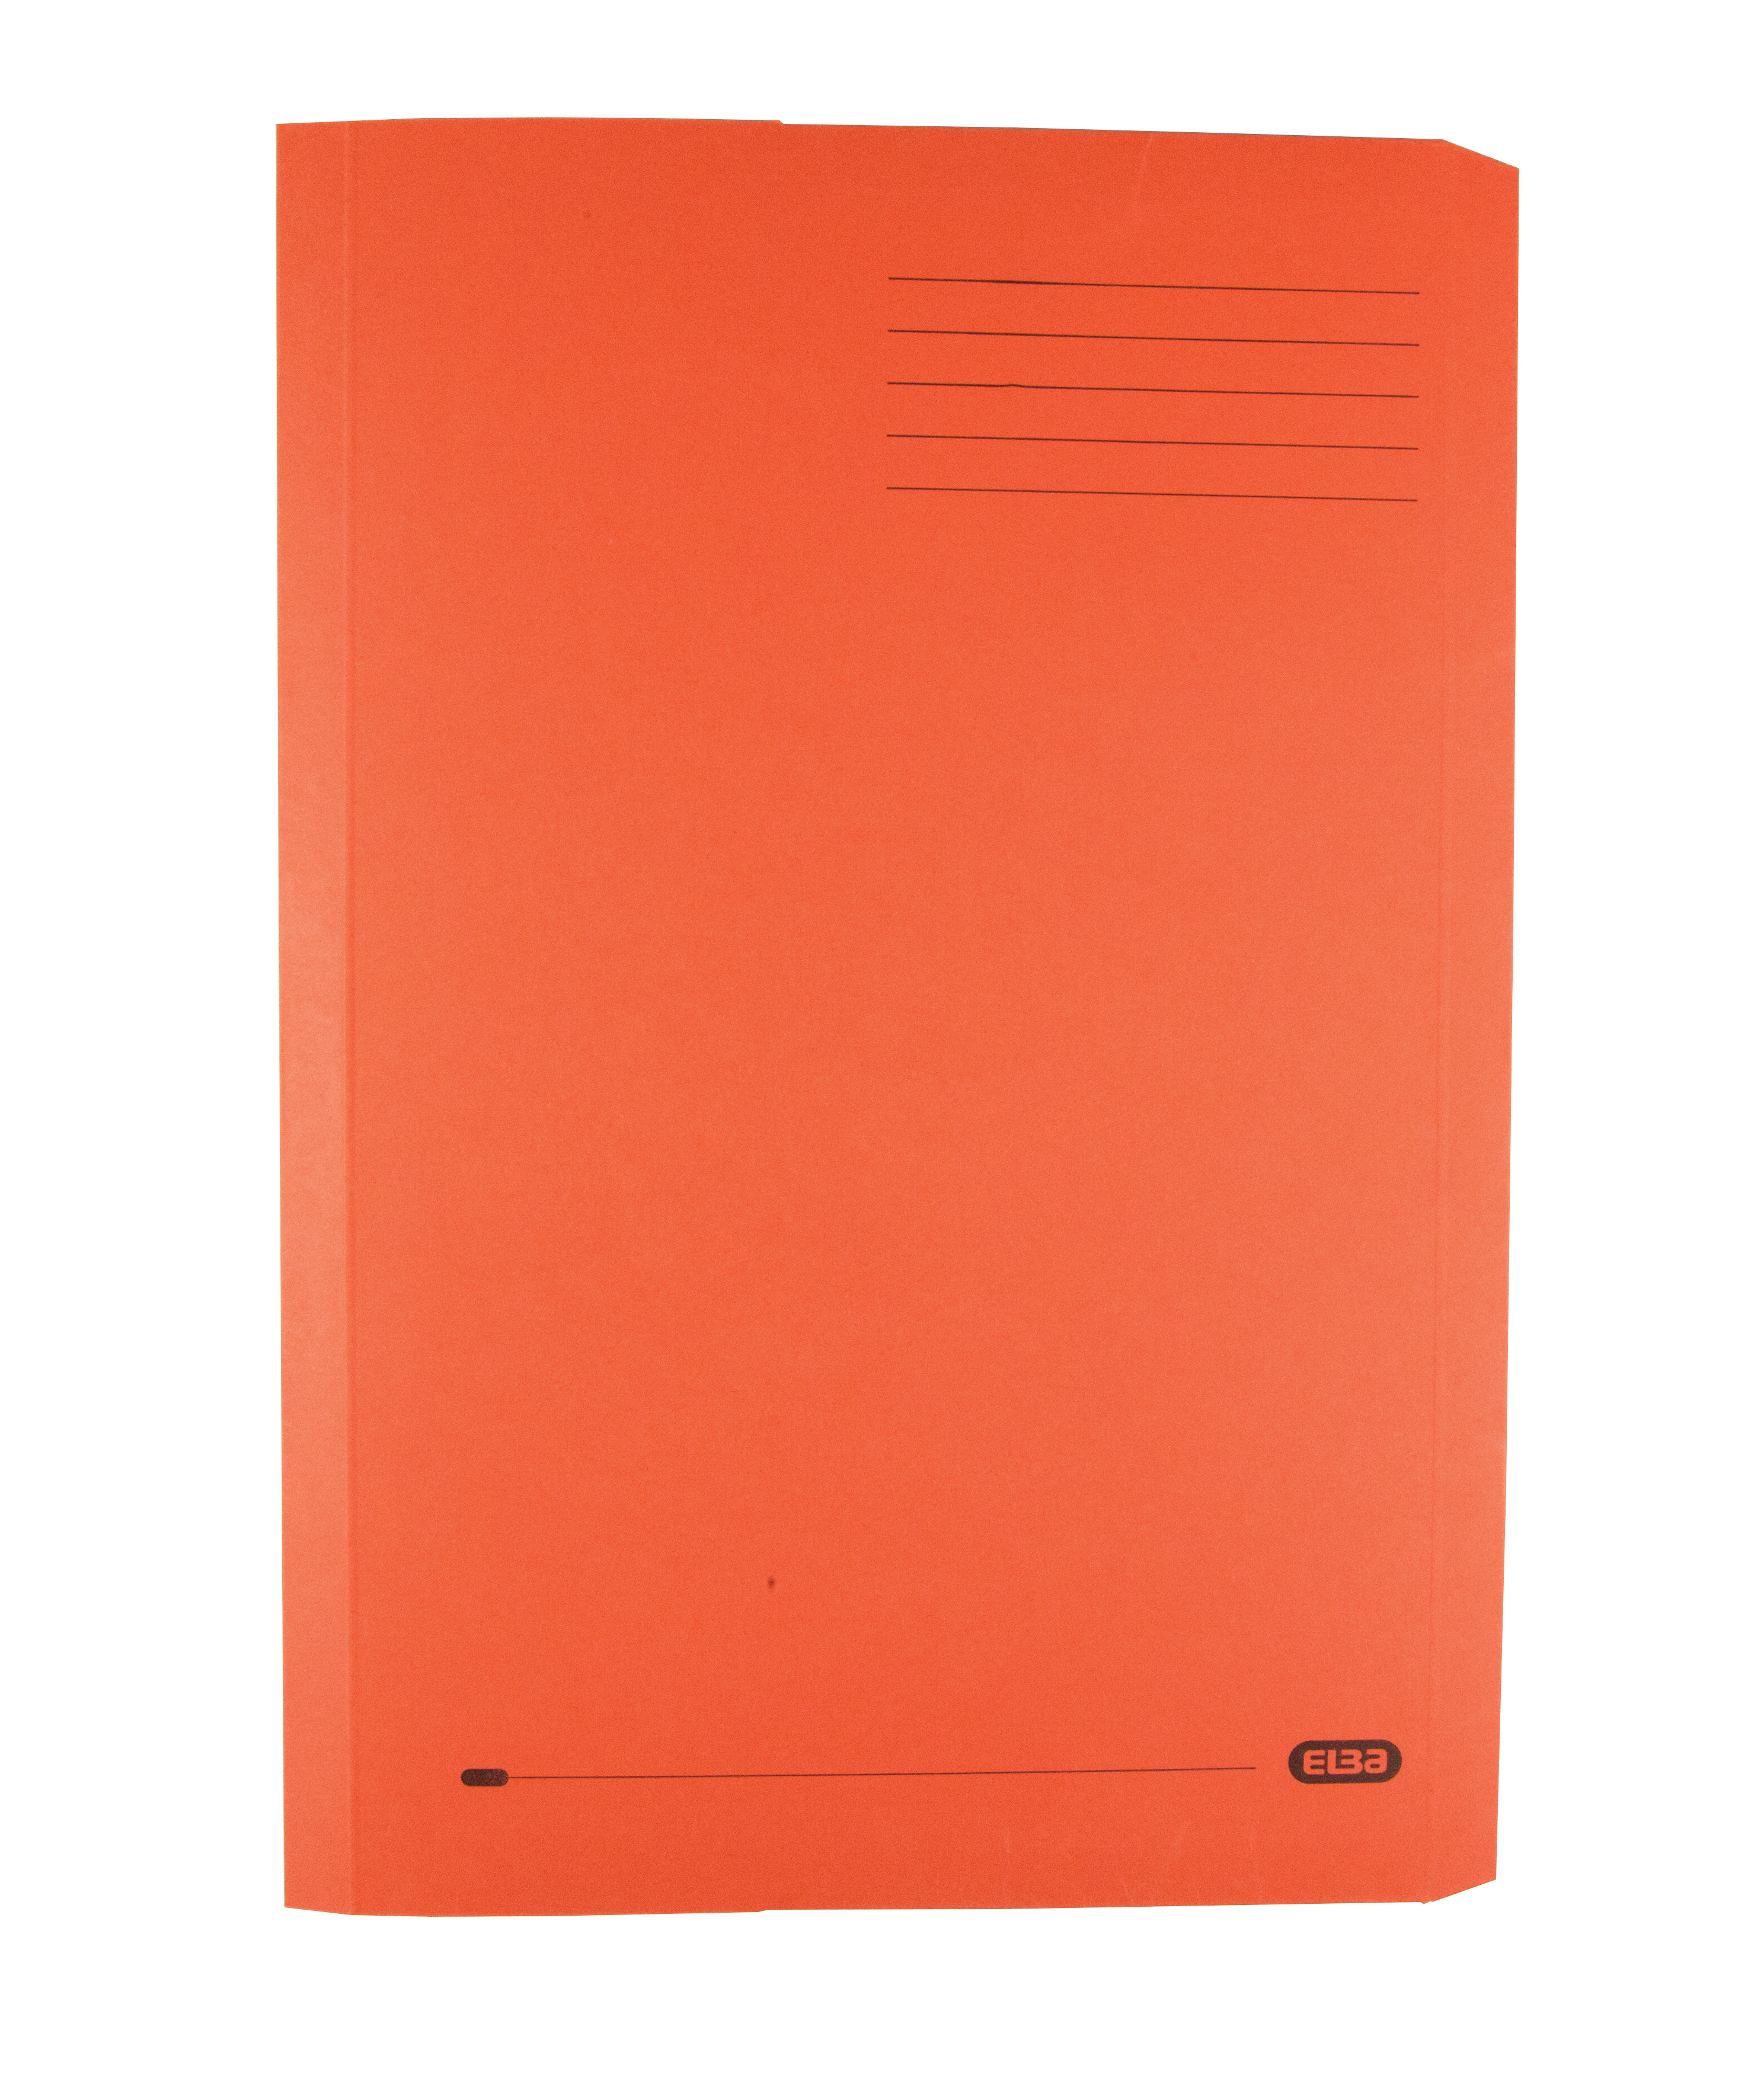 Elba Clifton Flat Bar Pocket (Rear) File 285gsm Capacity 50mm Foolscap Orange Ref 100090321 [Pack 25]